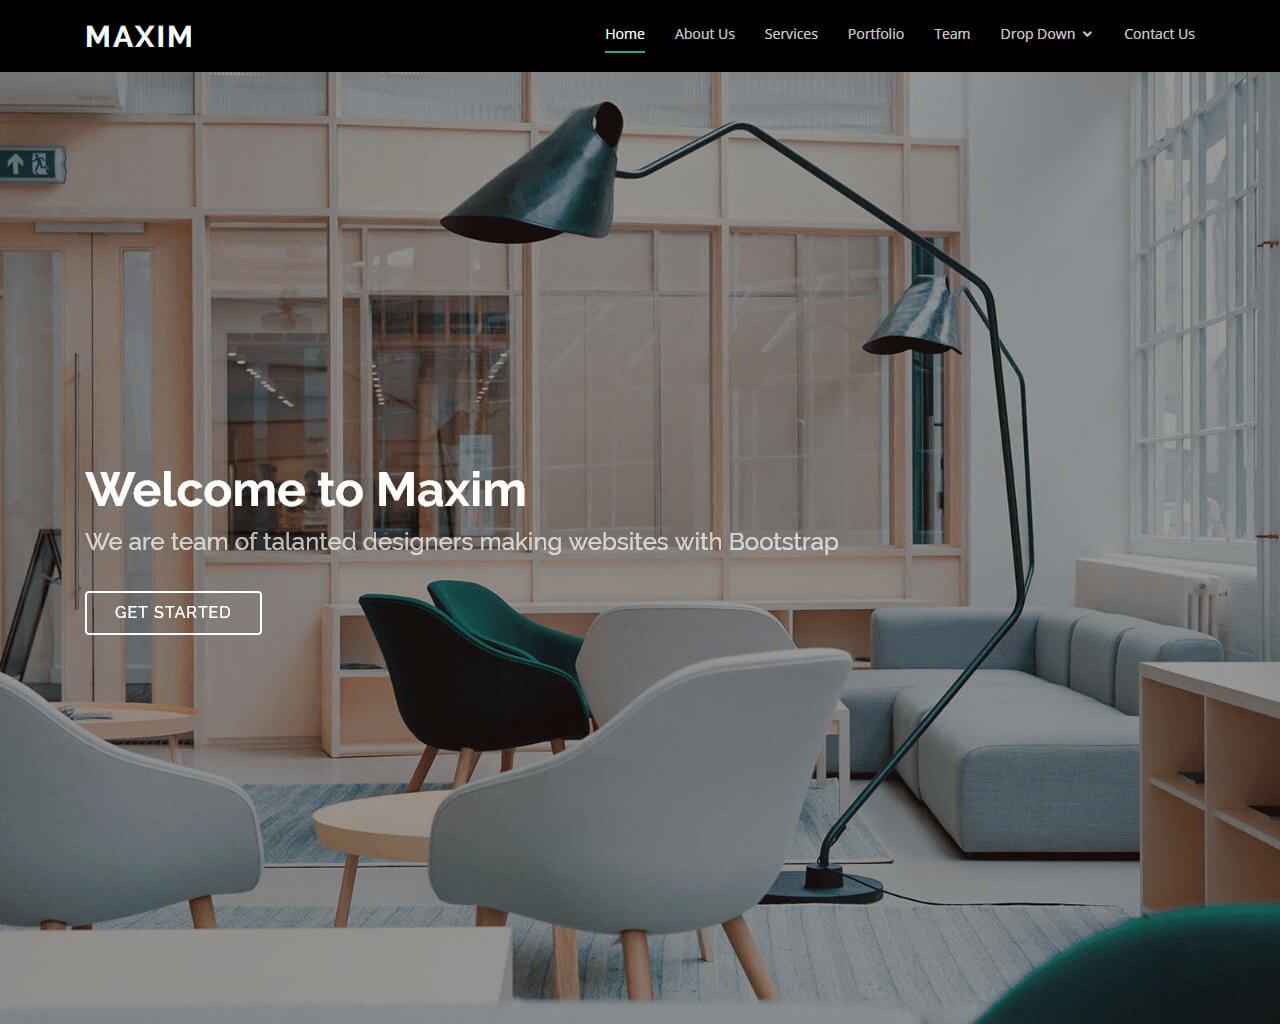 Maxim - Free Onepage Bootstrap Theme